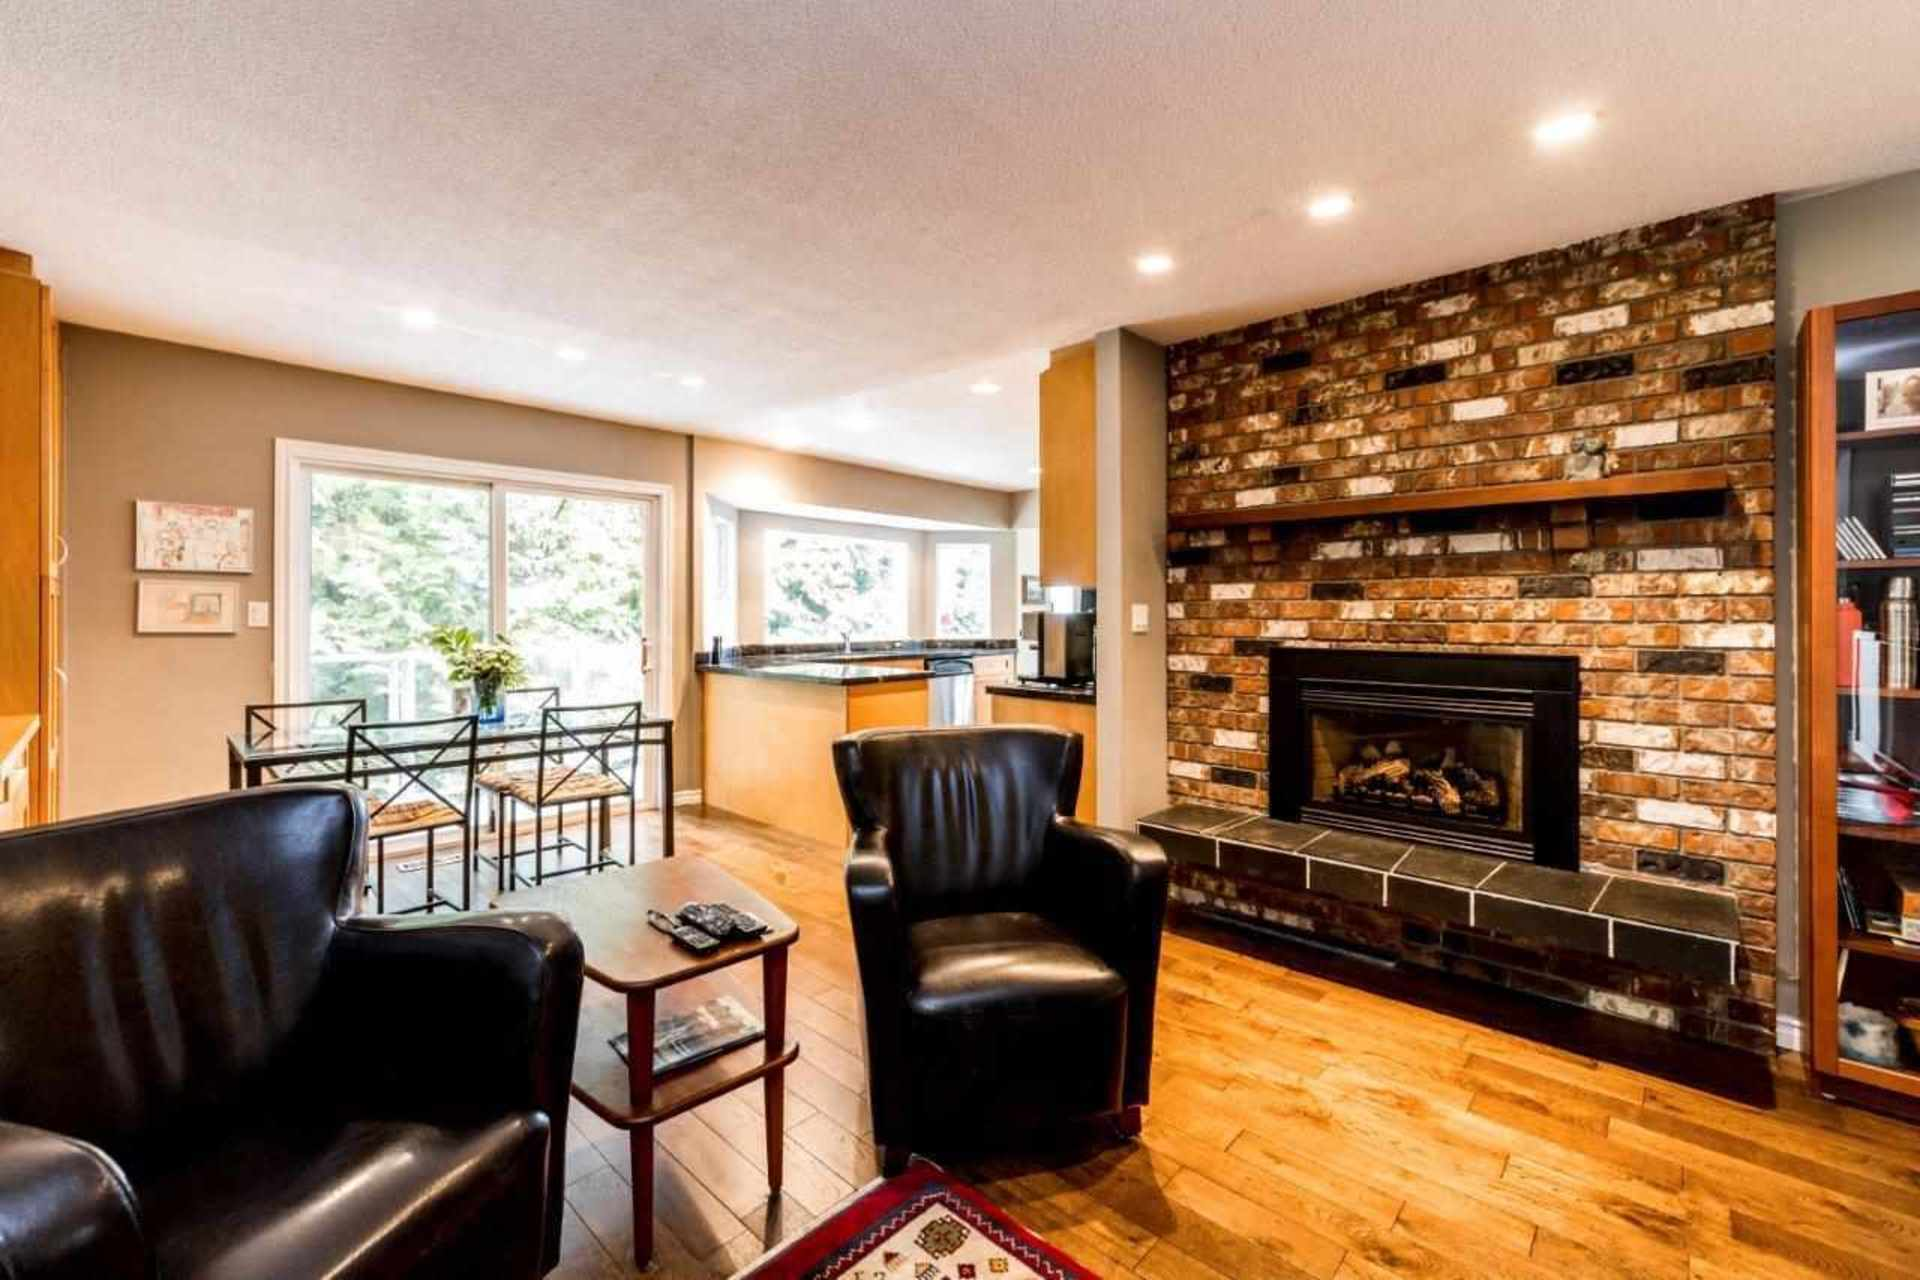 3863-st-pauls-avenue-upper-lonsdale-north-vancouver-07 at 3863 St. Pauls Avenue, Upper Lonsdale, North Vancouver